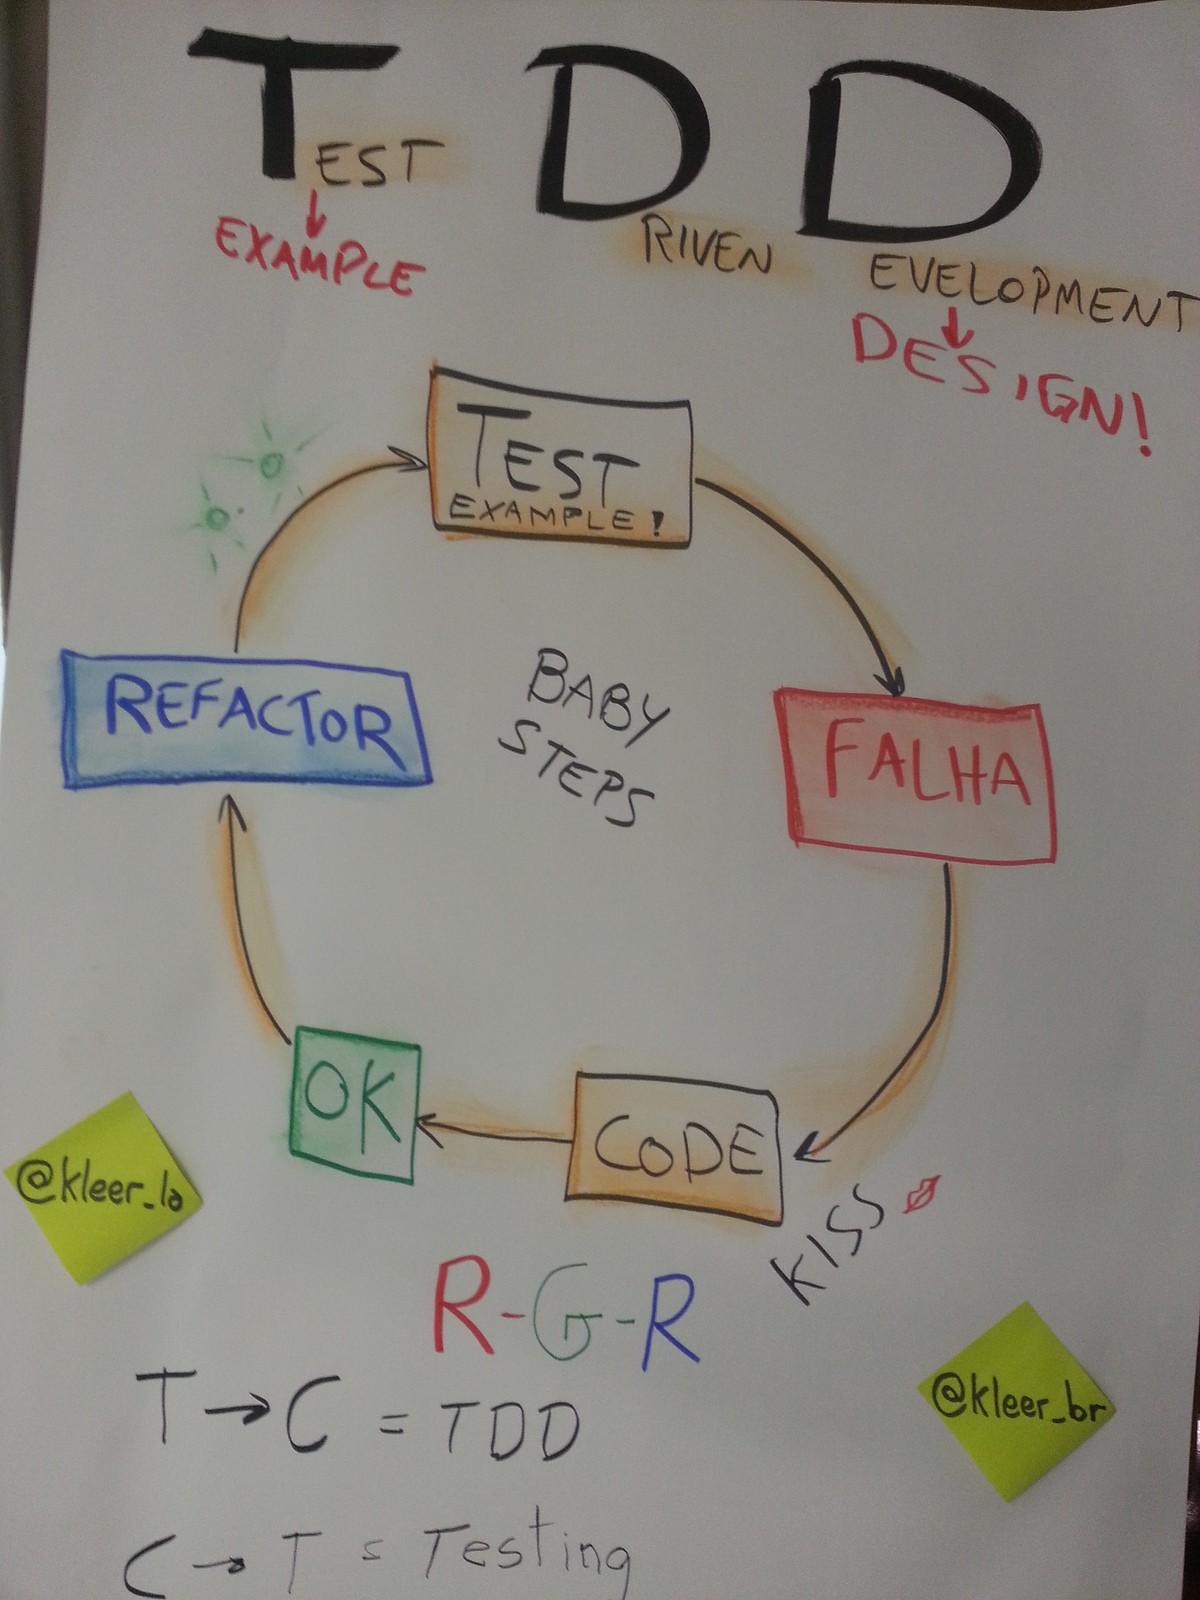 Test driven development tdd what is test driven development tdd baditri Images